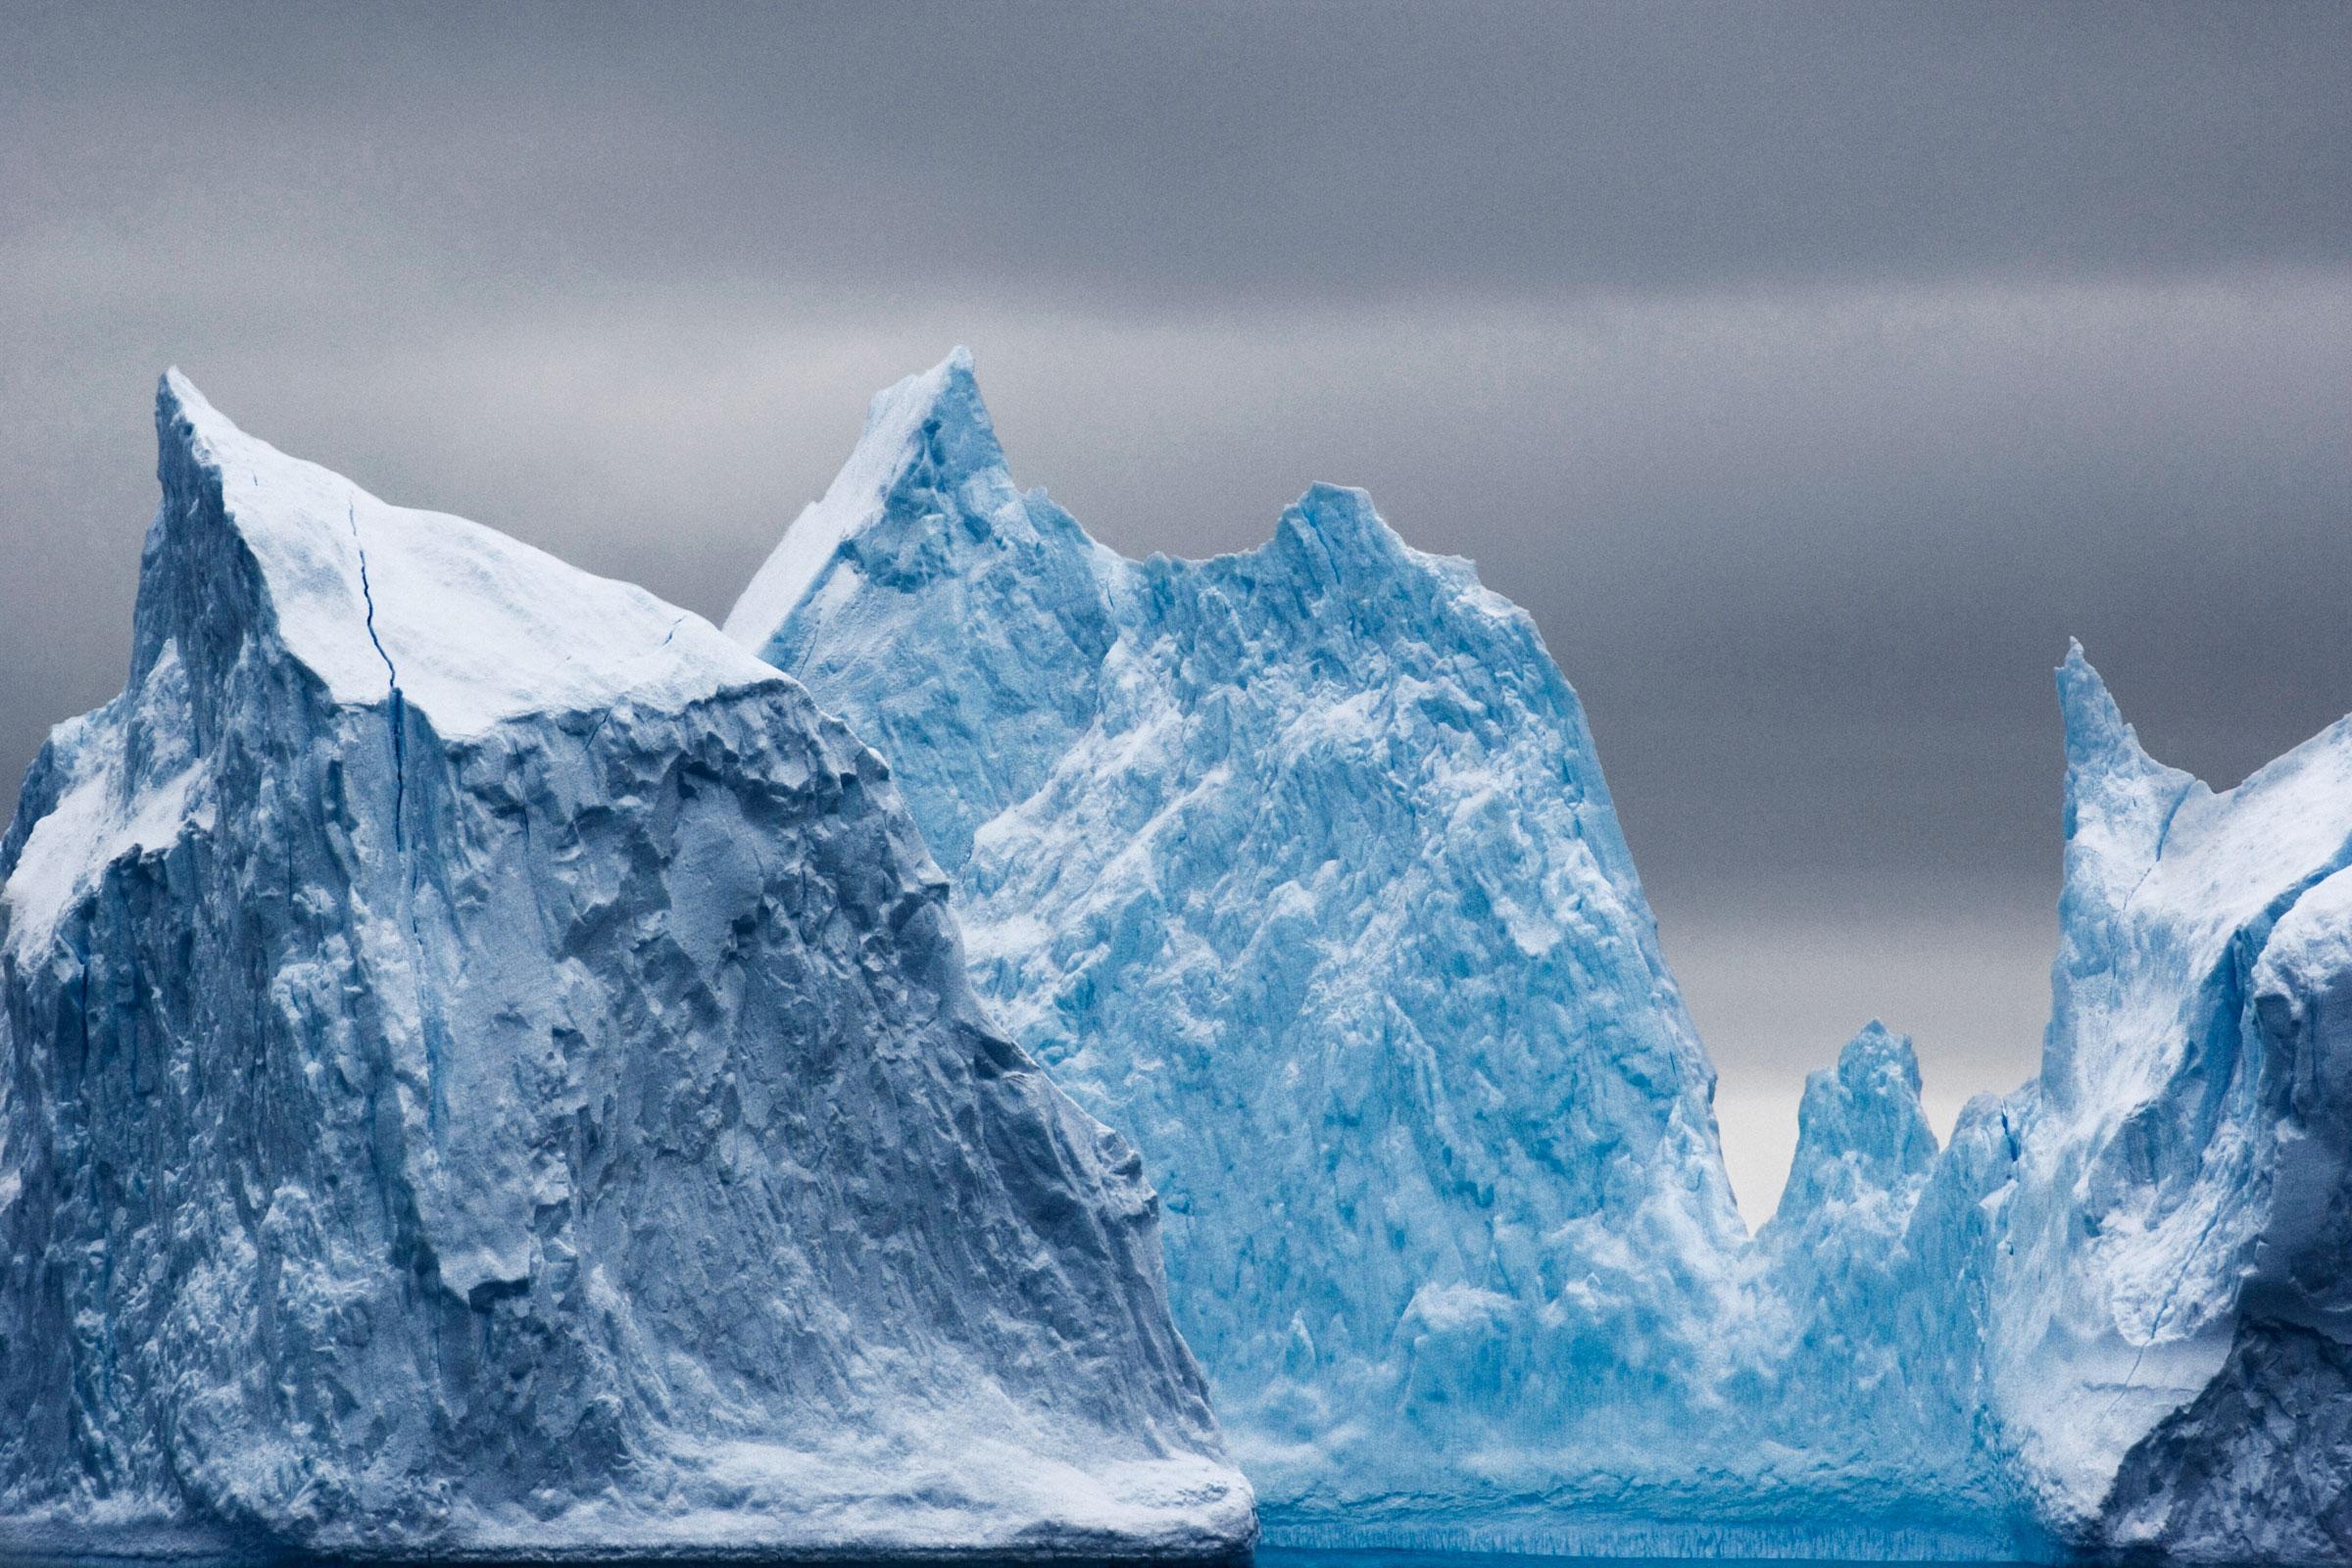 Iceberg. Ross Sea, Antarctica. John Weller